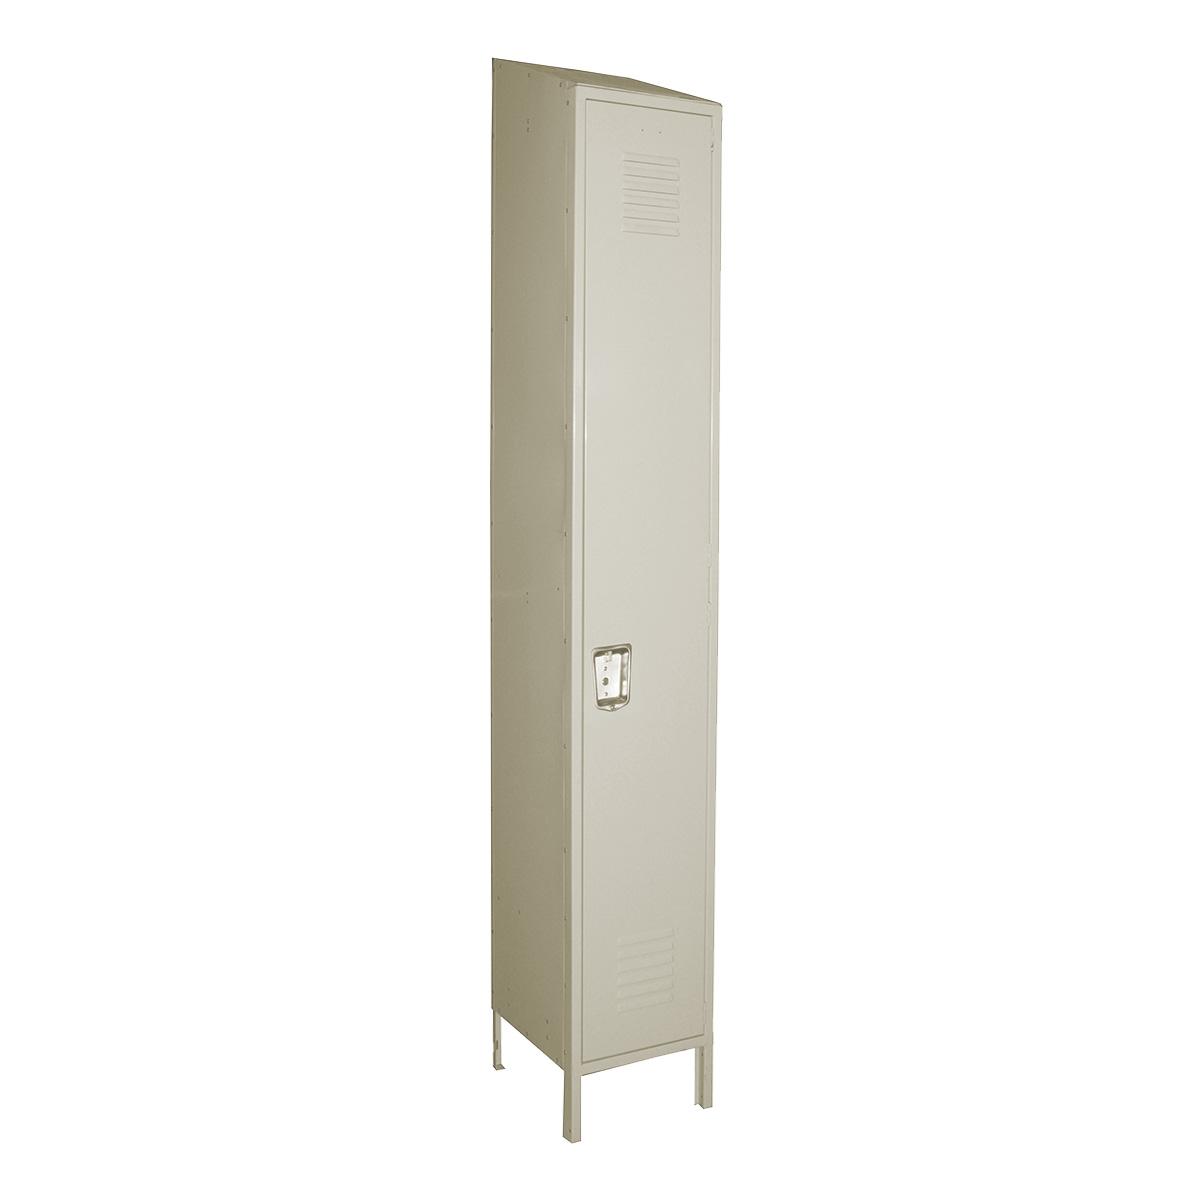 discounted lockers for sale schoollockers com rh schoollockers com